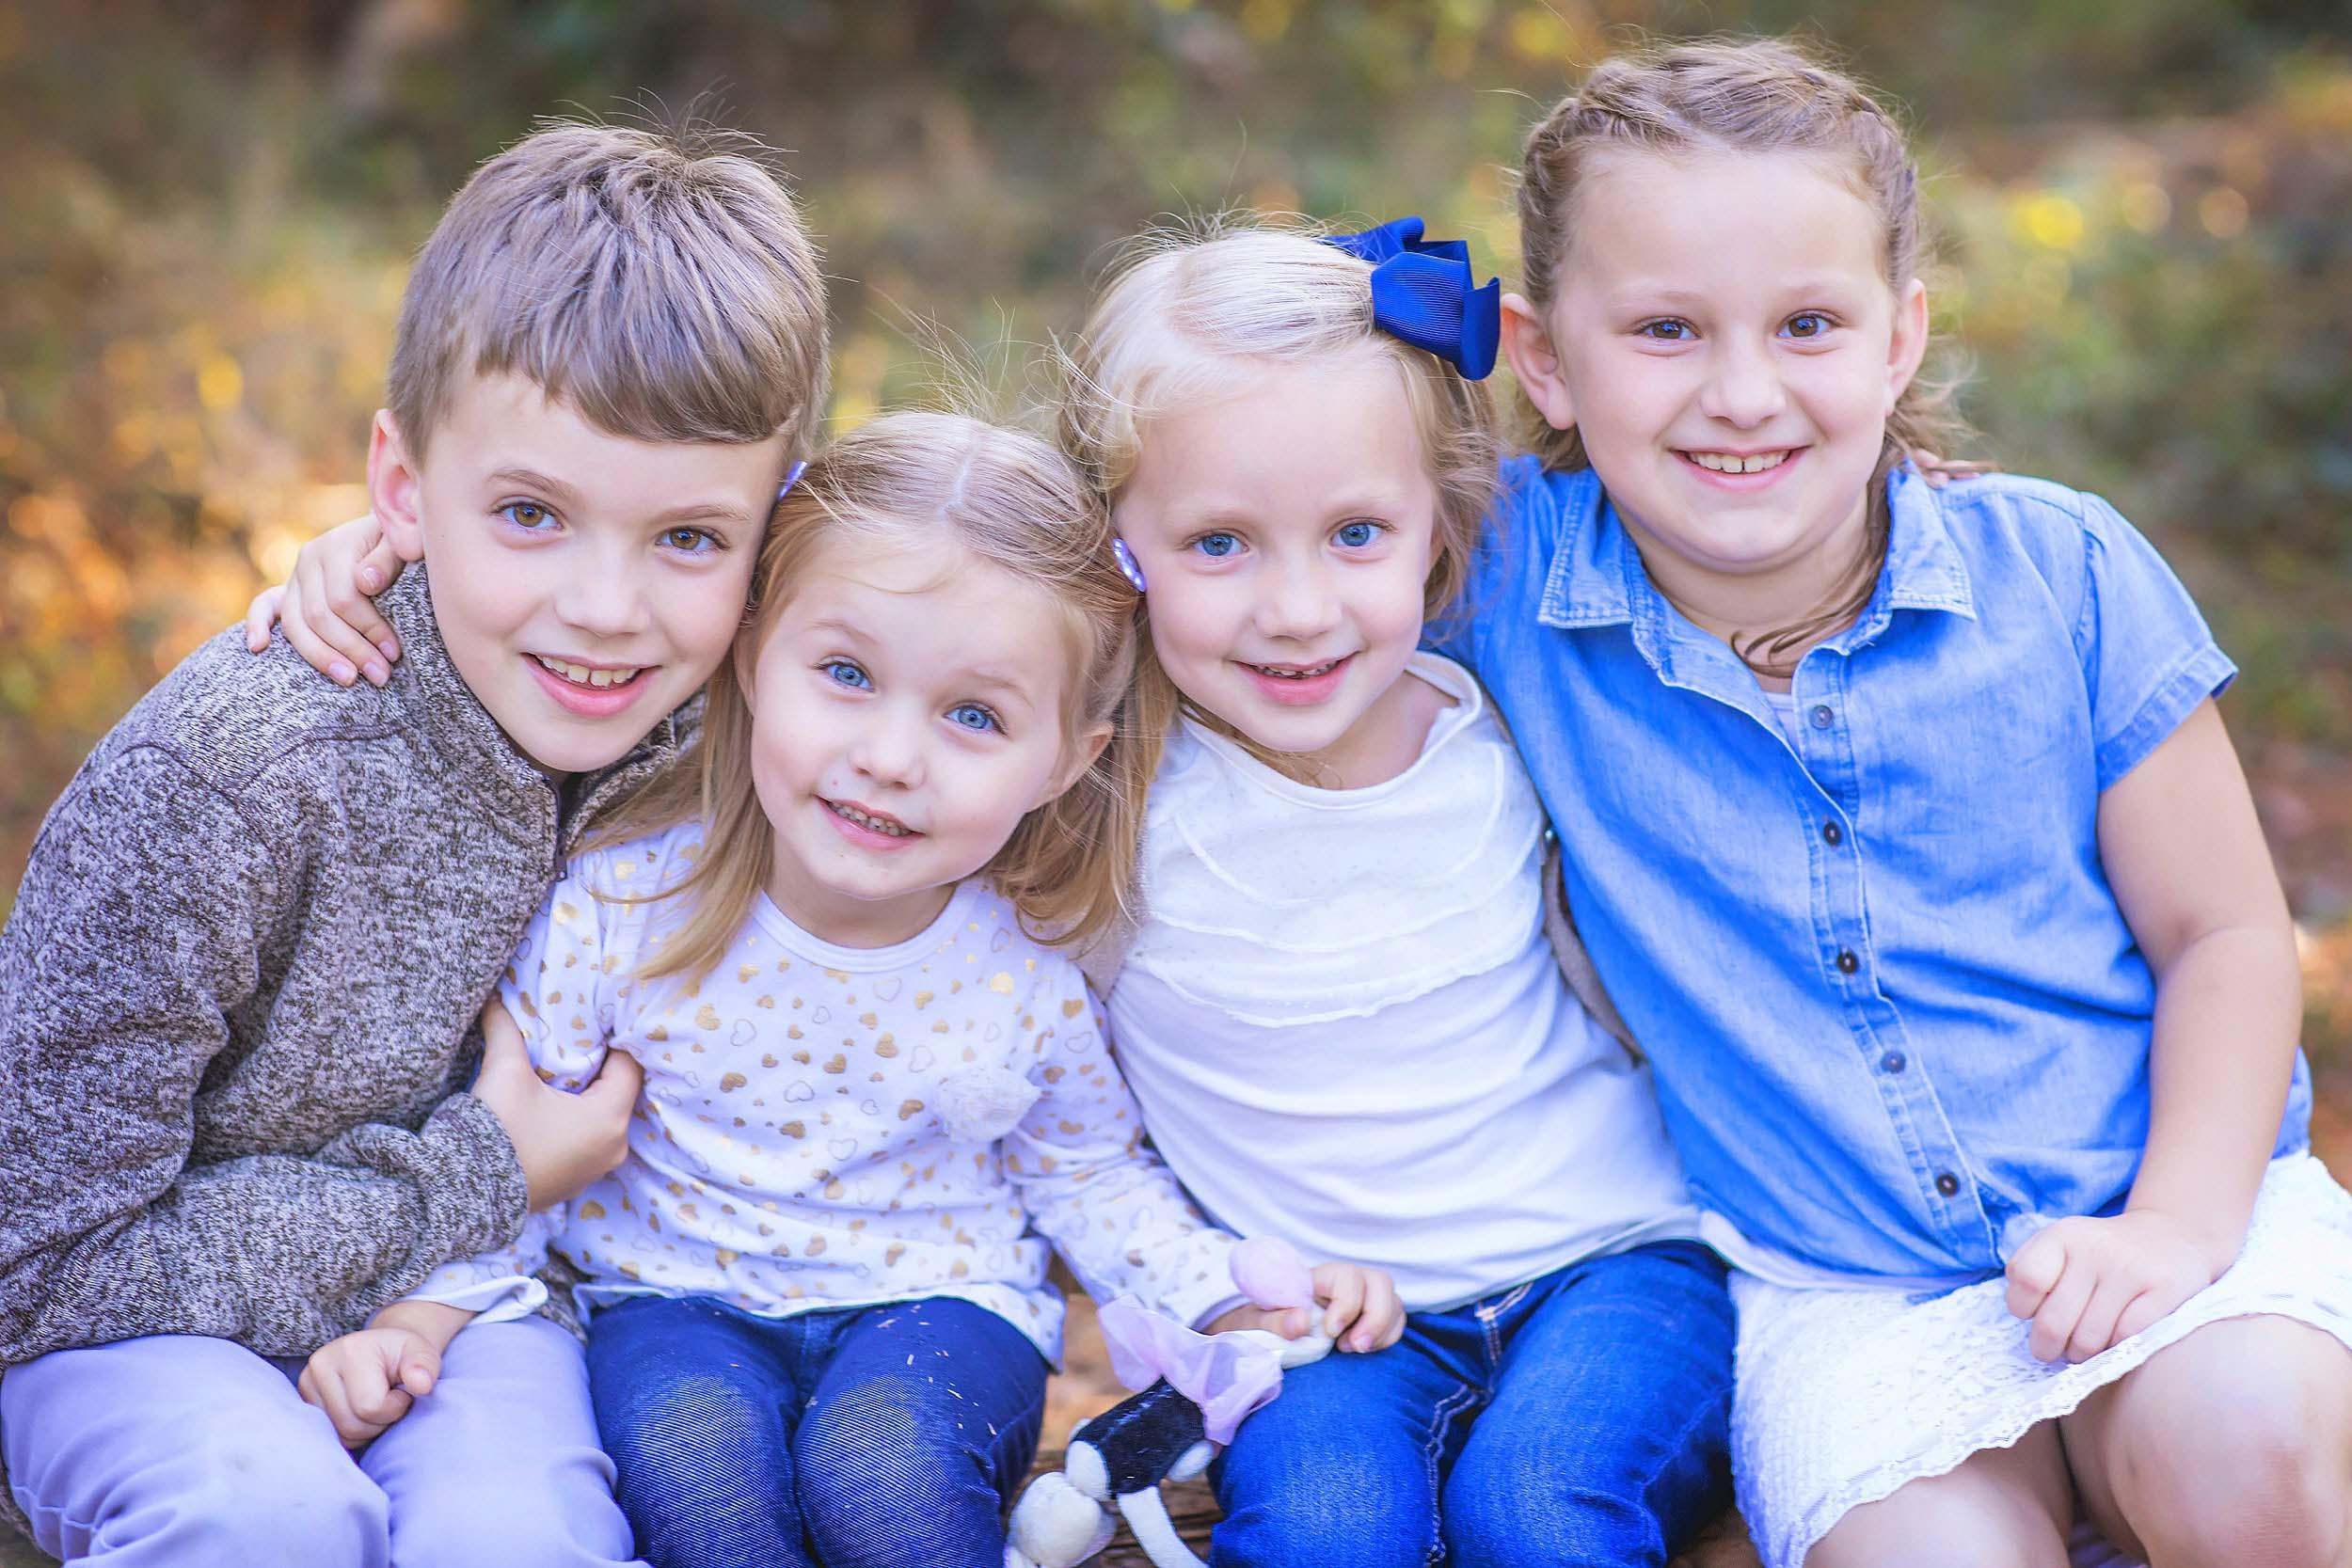 Outdoor portrait of four siblings hugging